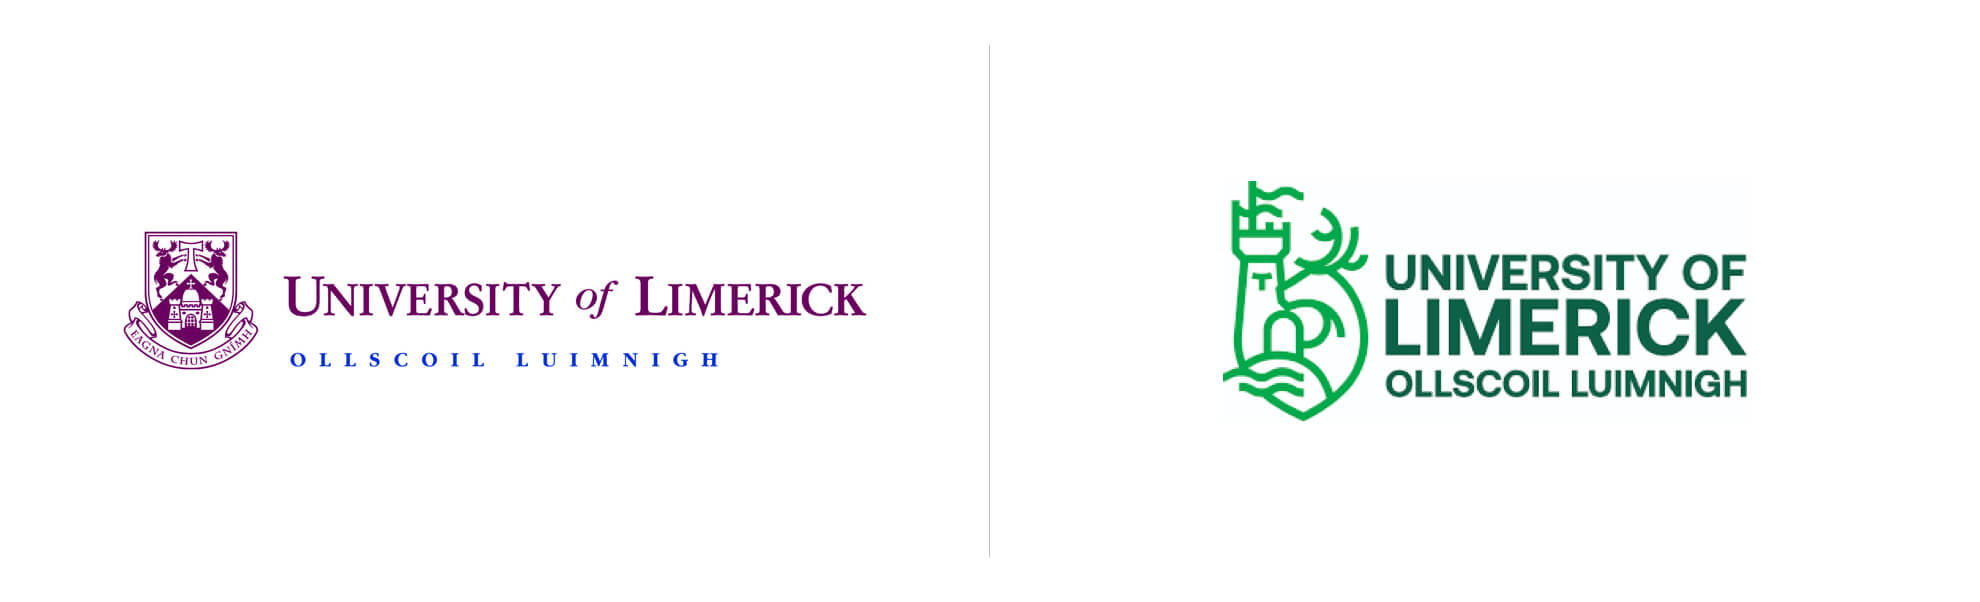 Stare inowe logo Uniwersity of Limerick